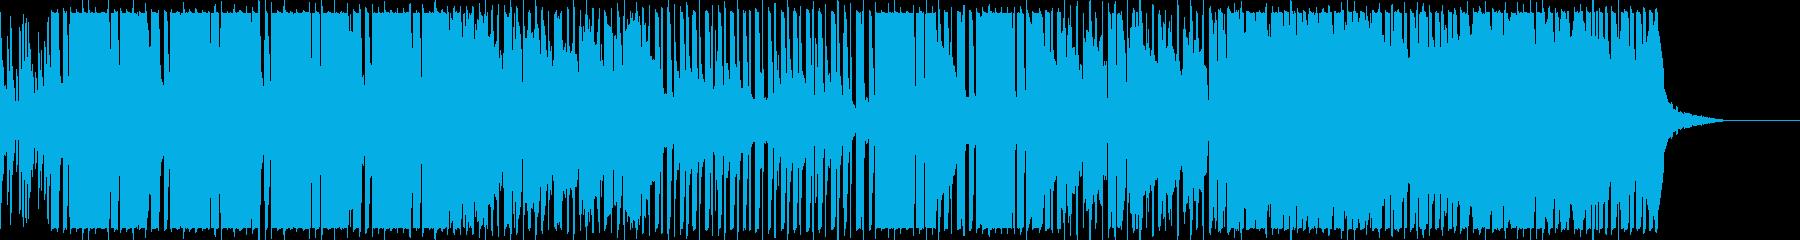 EDM JAPAN 2020 尺八 琴の再生済みの波形